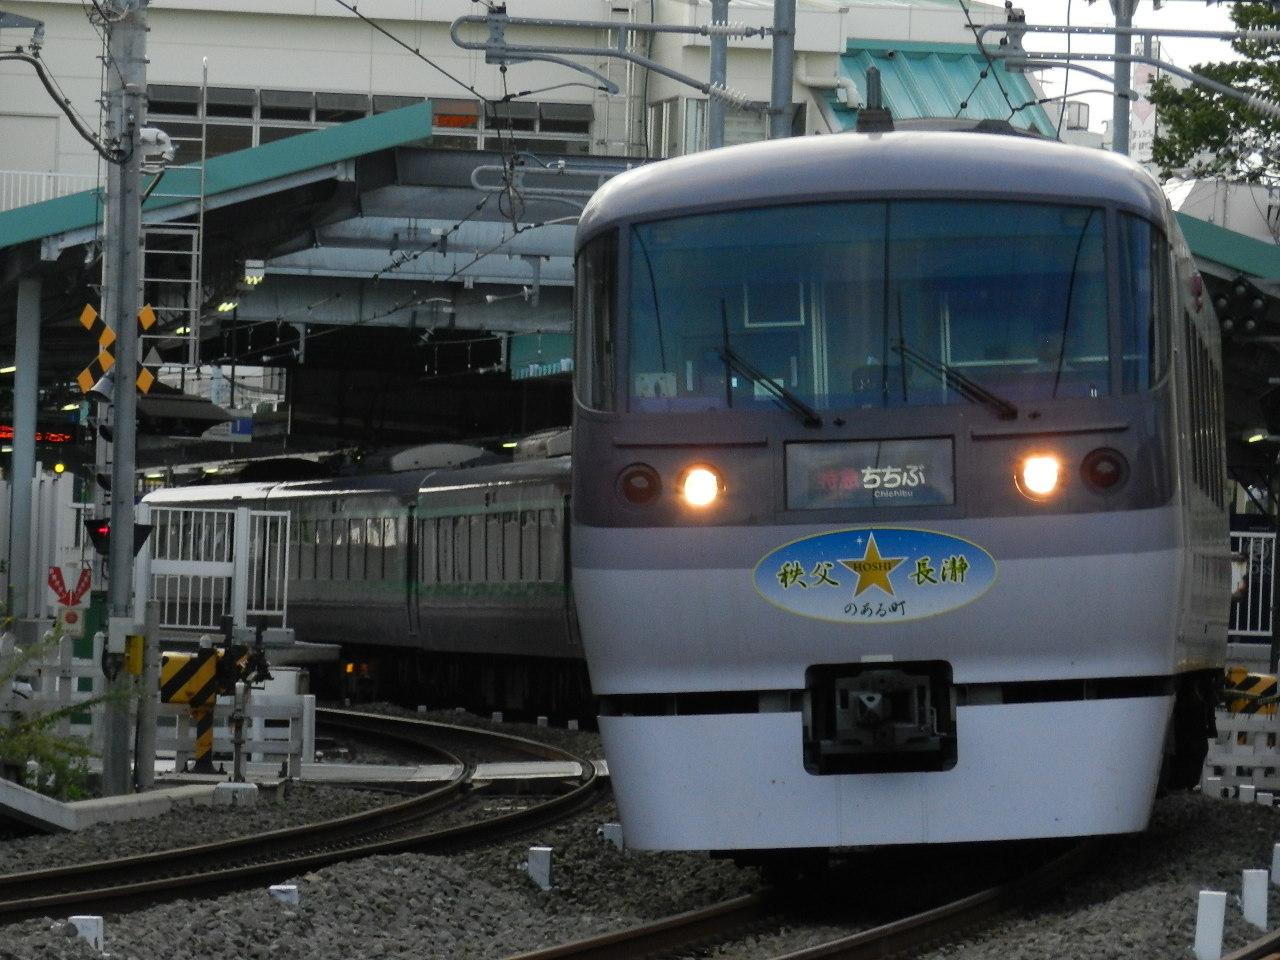 2012-09-09 006